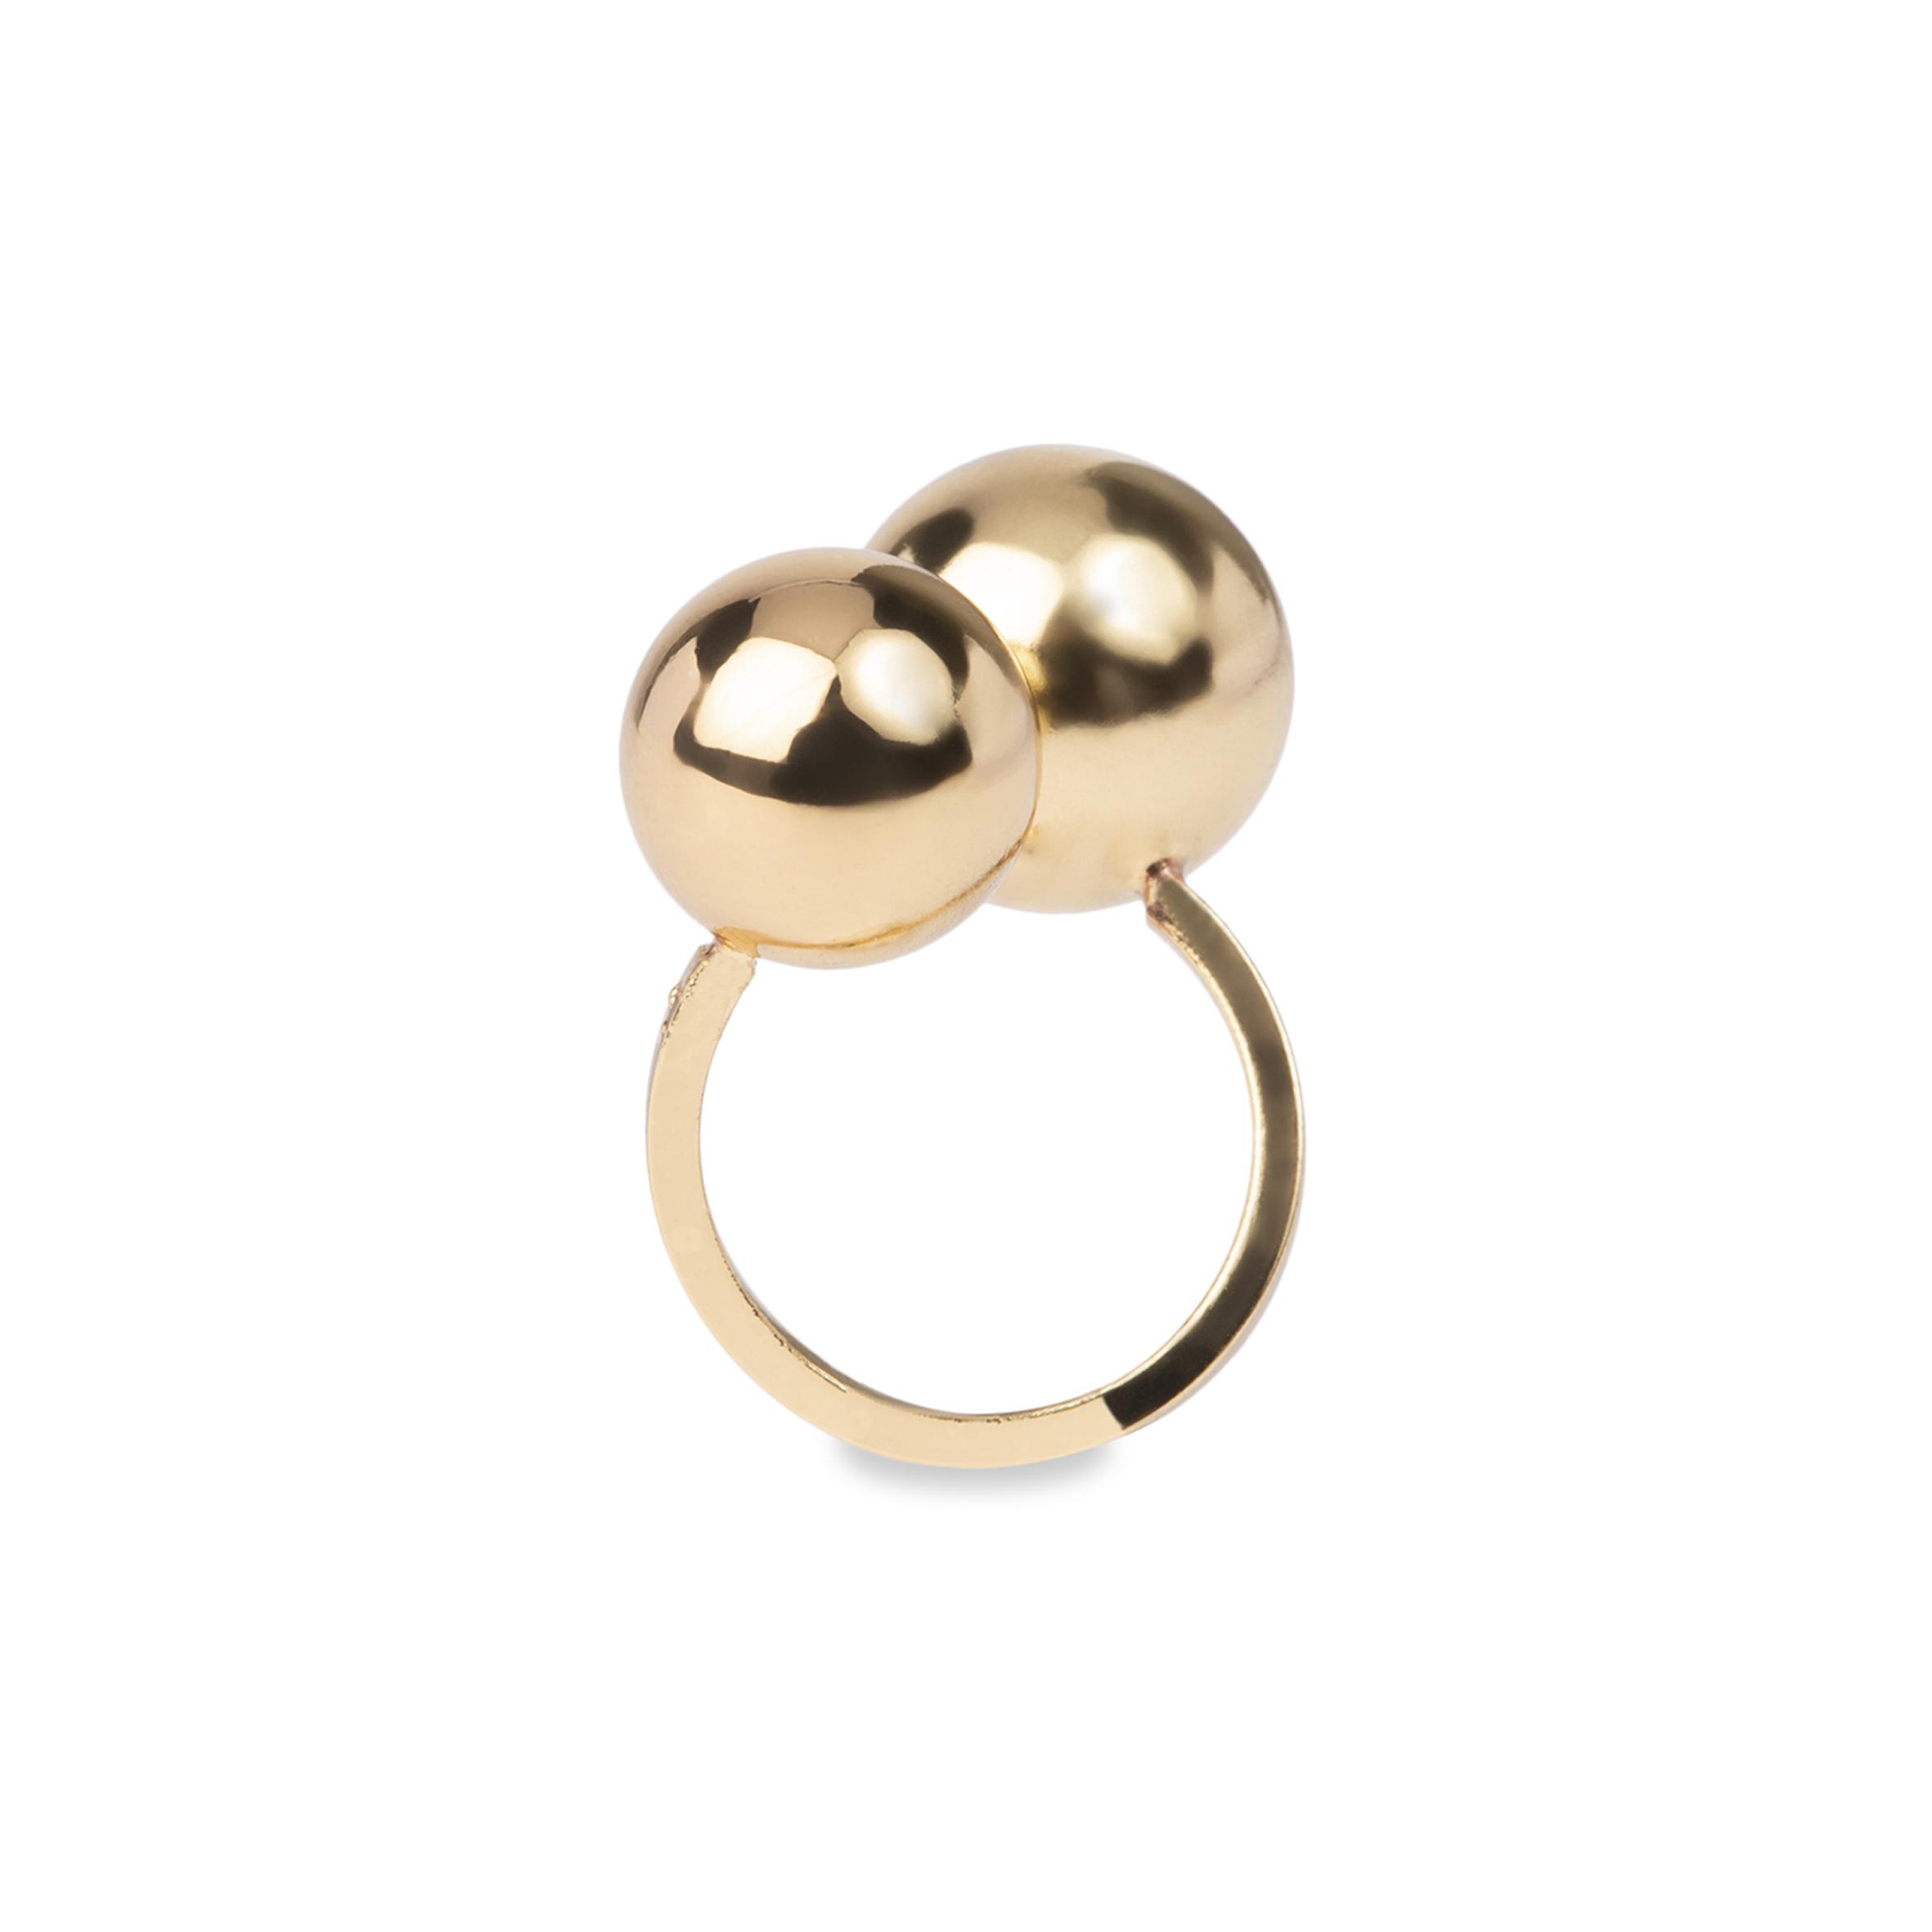 Damsmycke pfg Stockholm NOIR-Divine Ring - size 19 56004-07